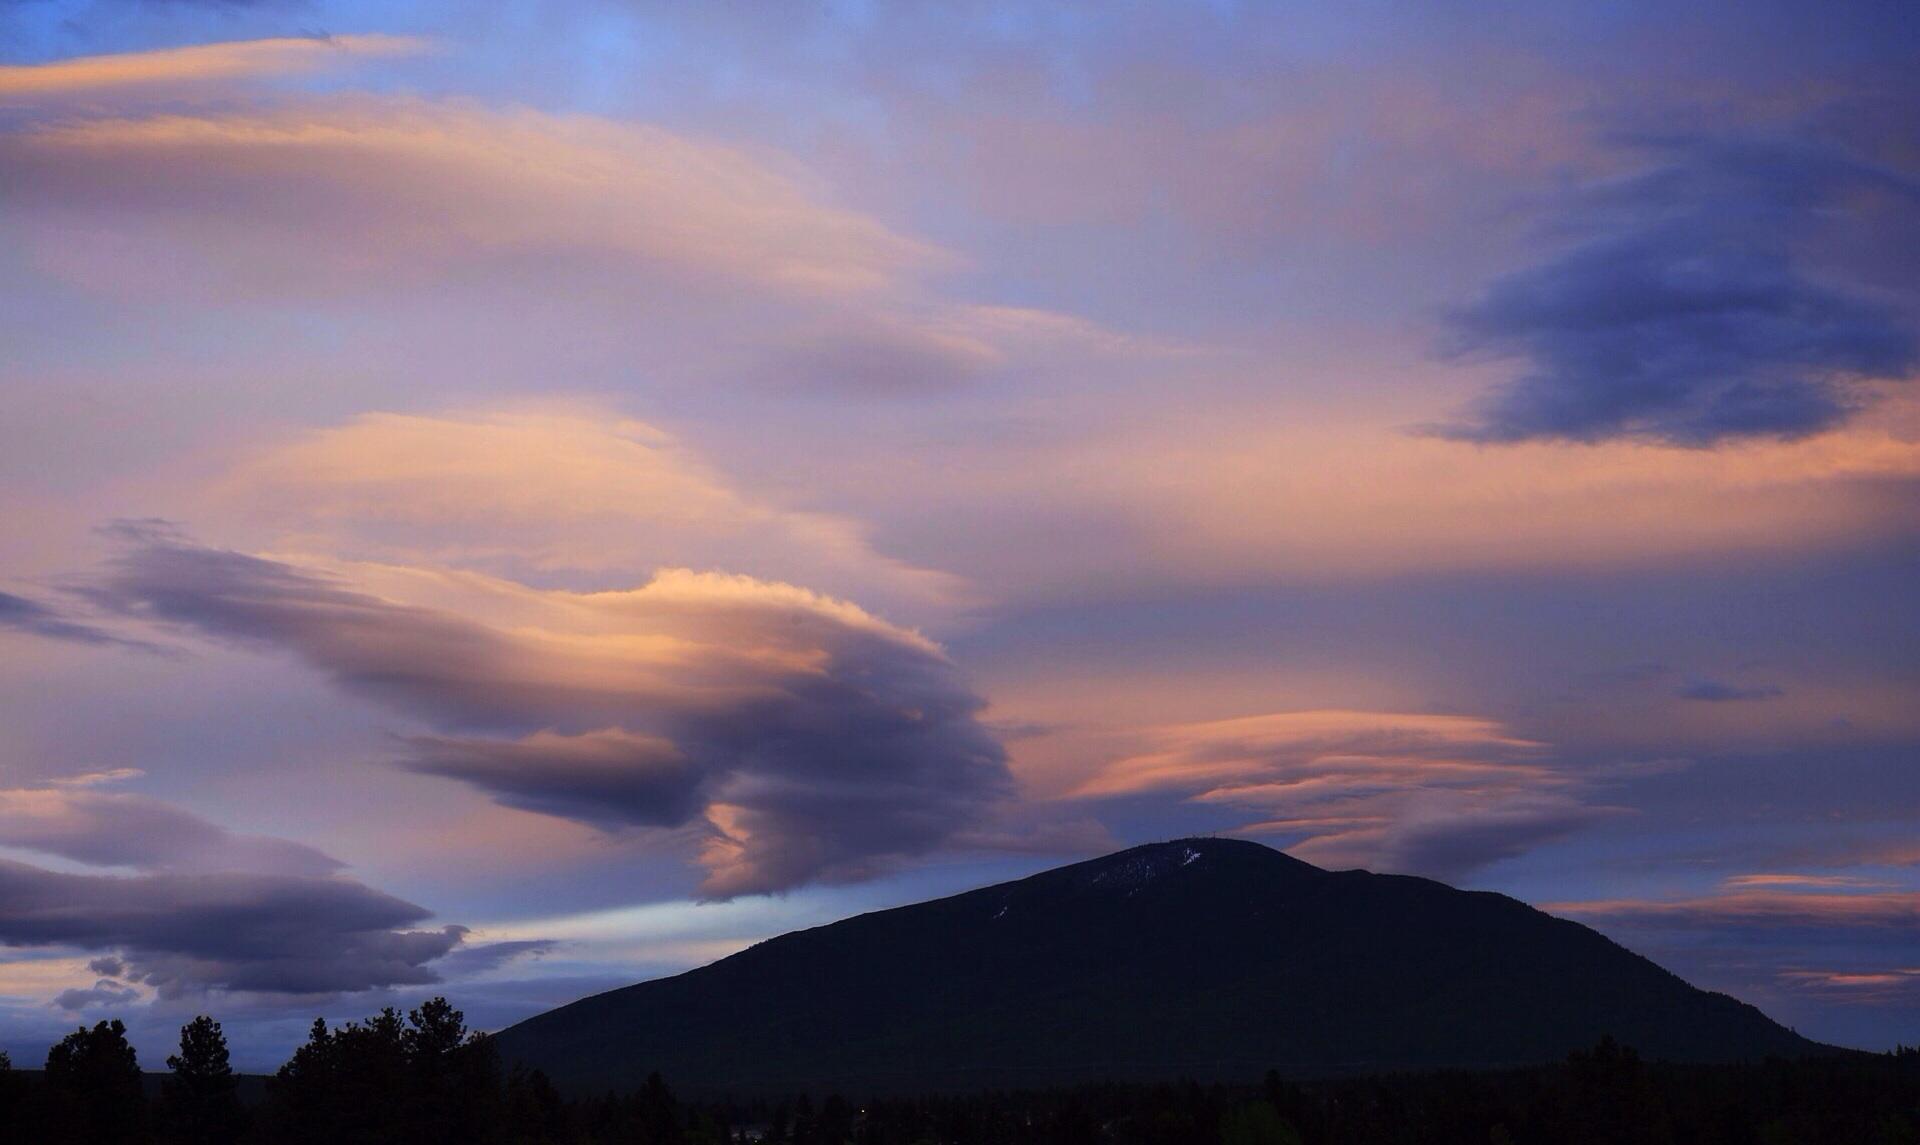 Sunset over Cranbrook, BC